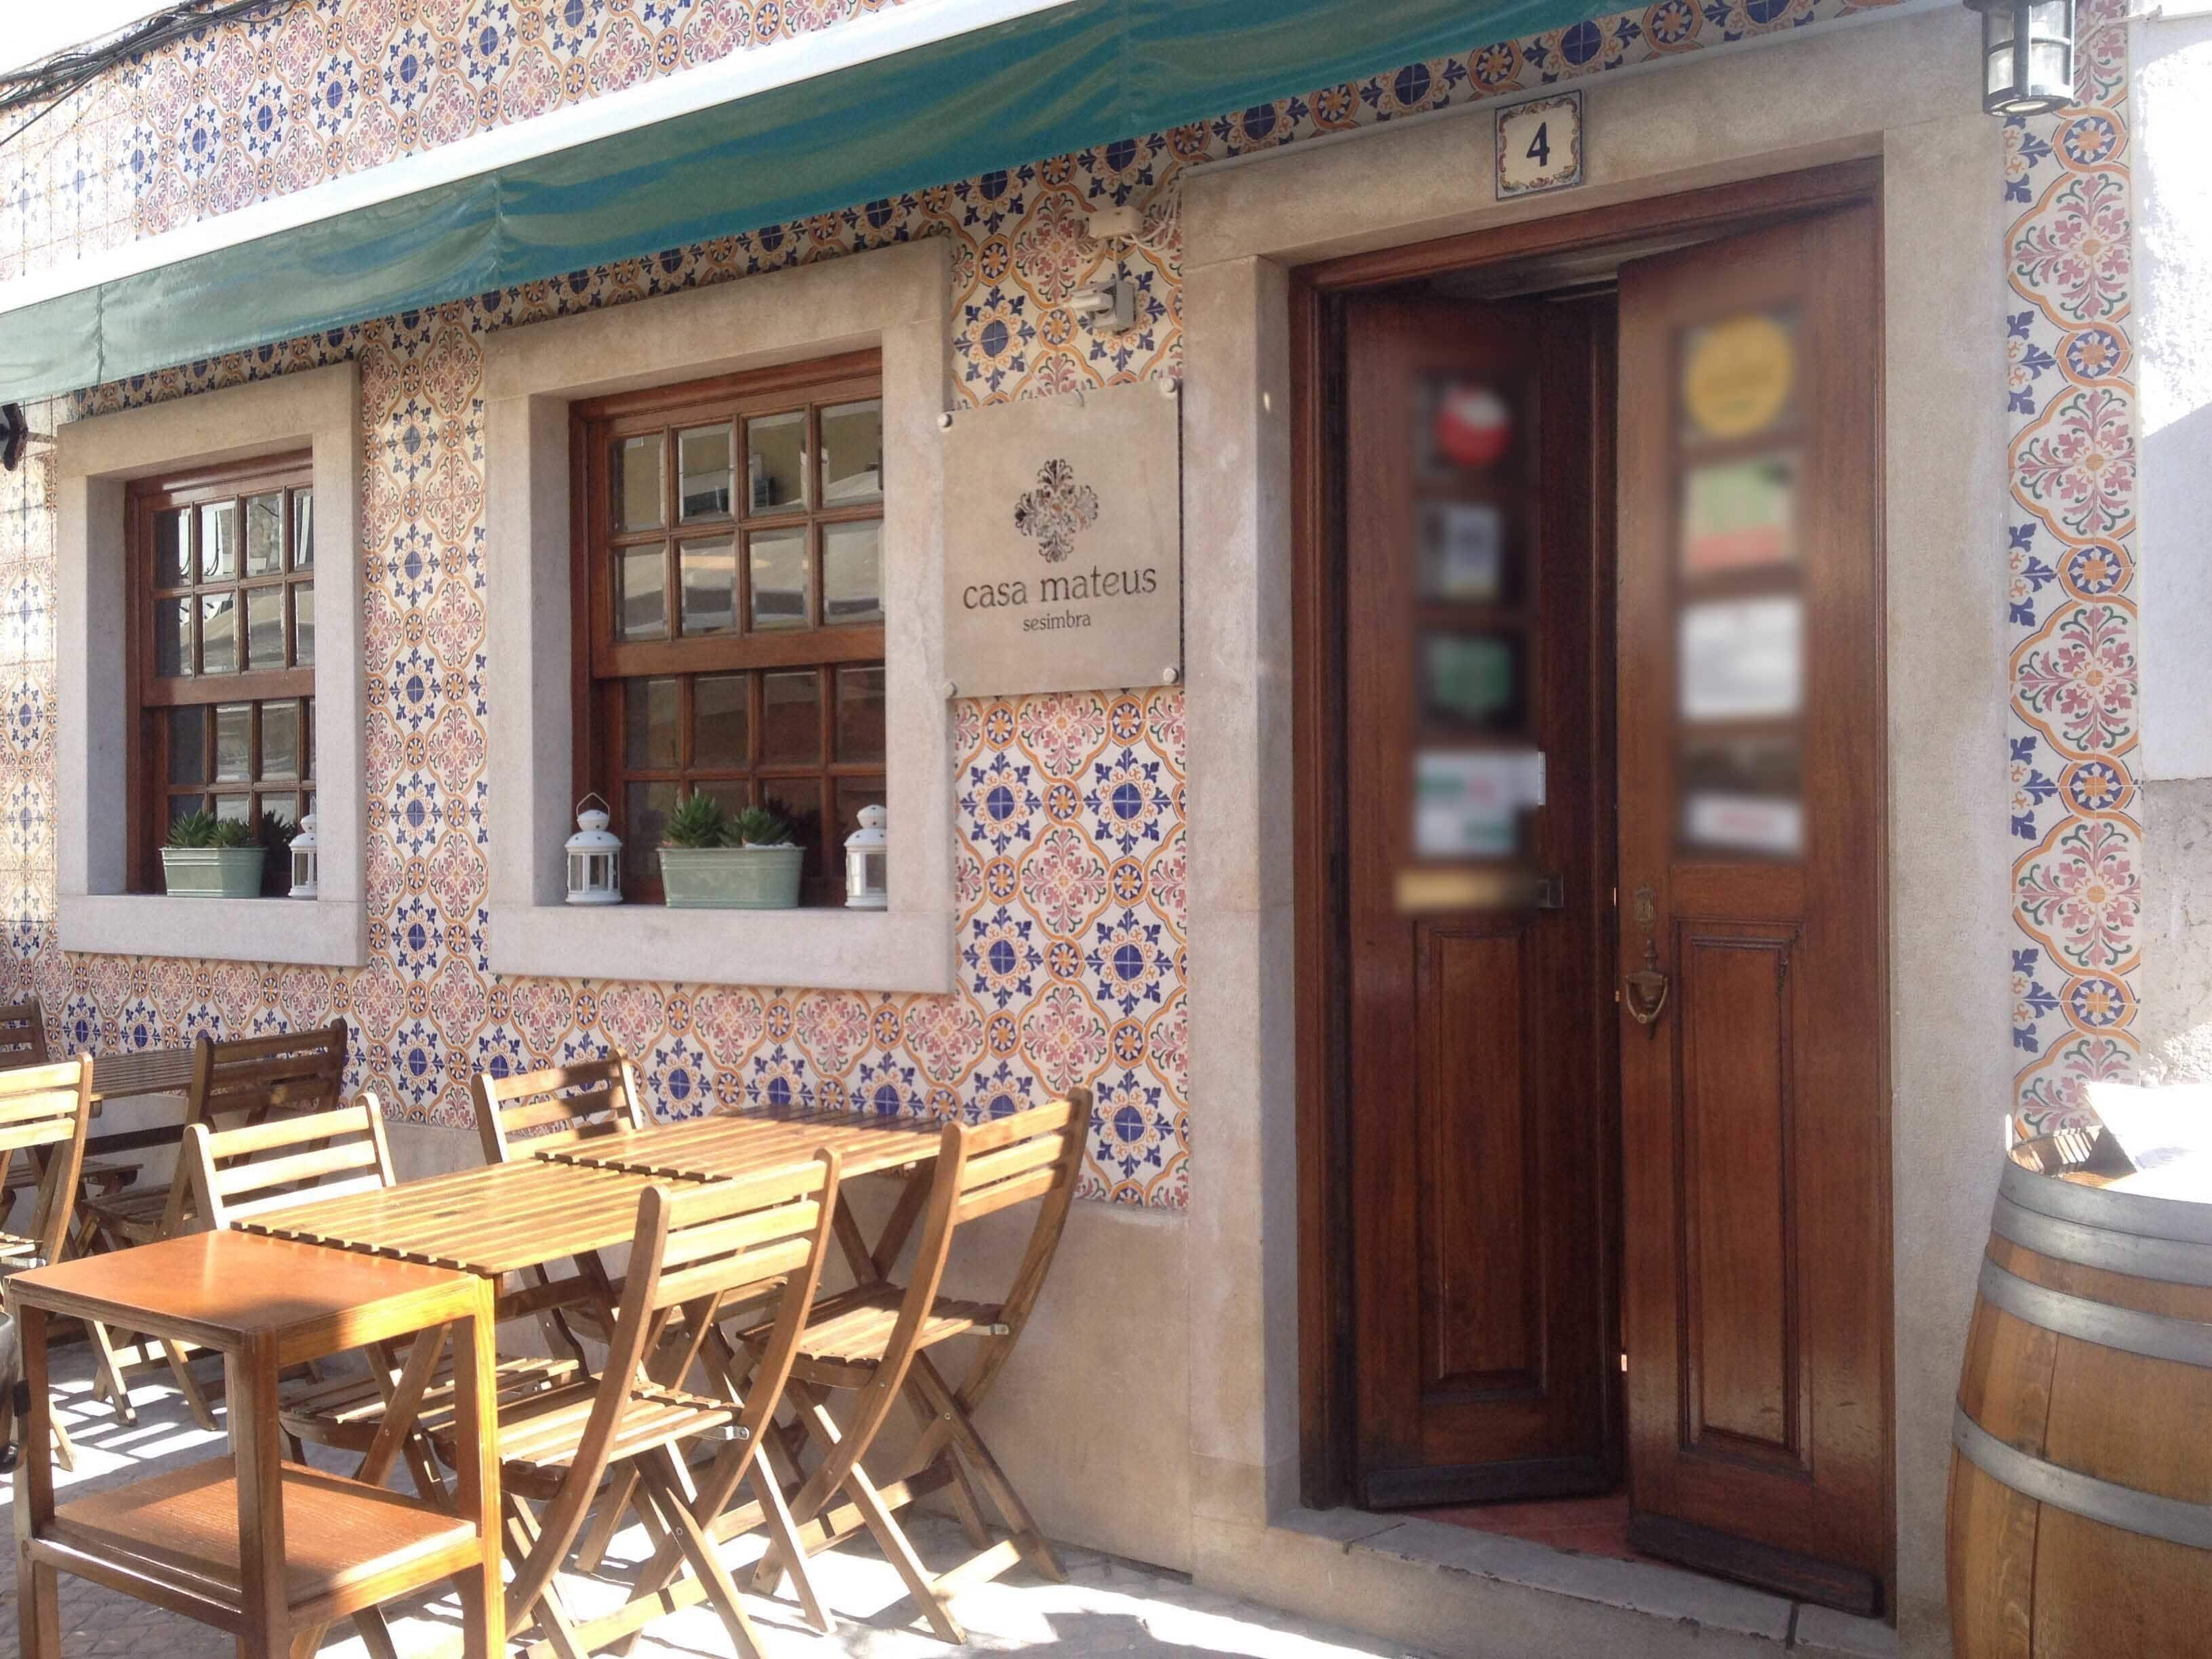 Casa Mateus Sesimbra Centro Greater Lisbon Zomato